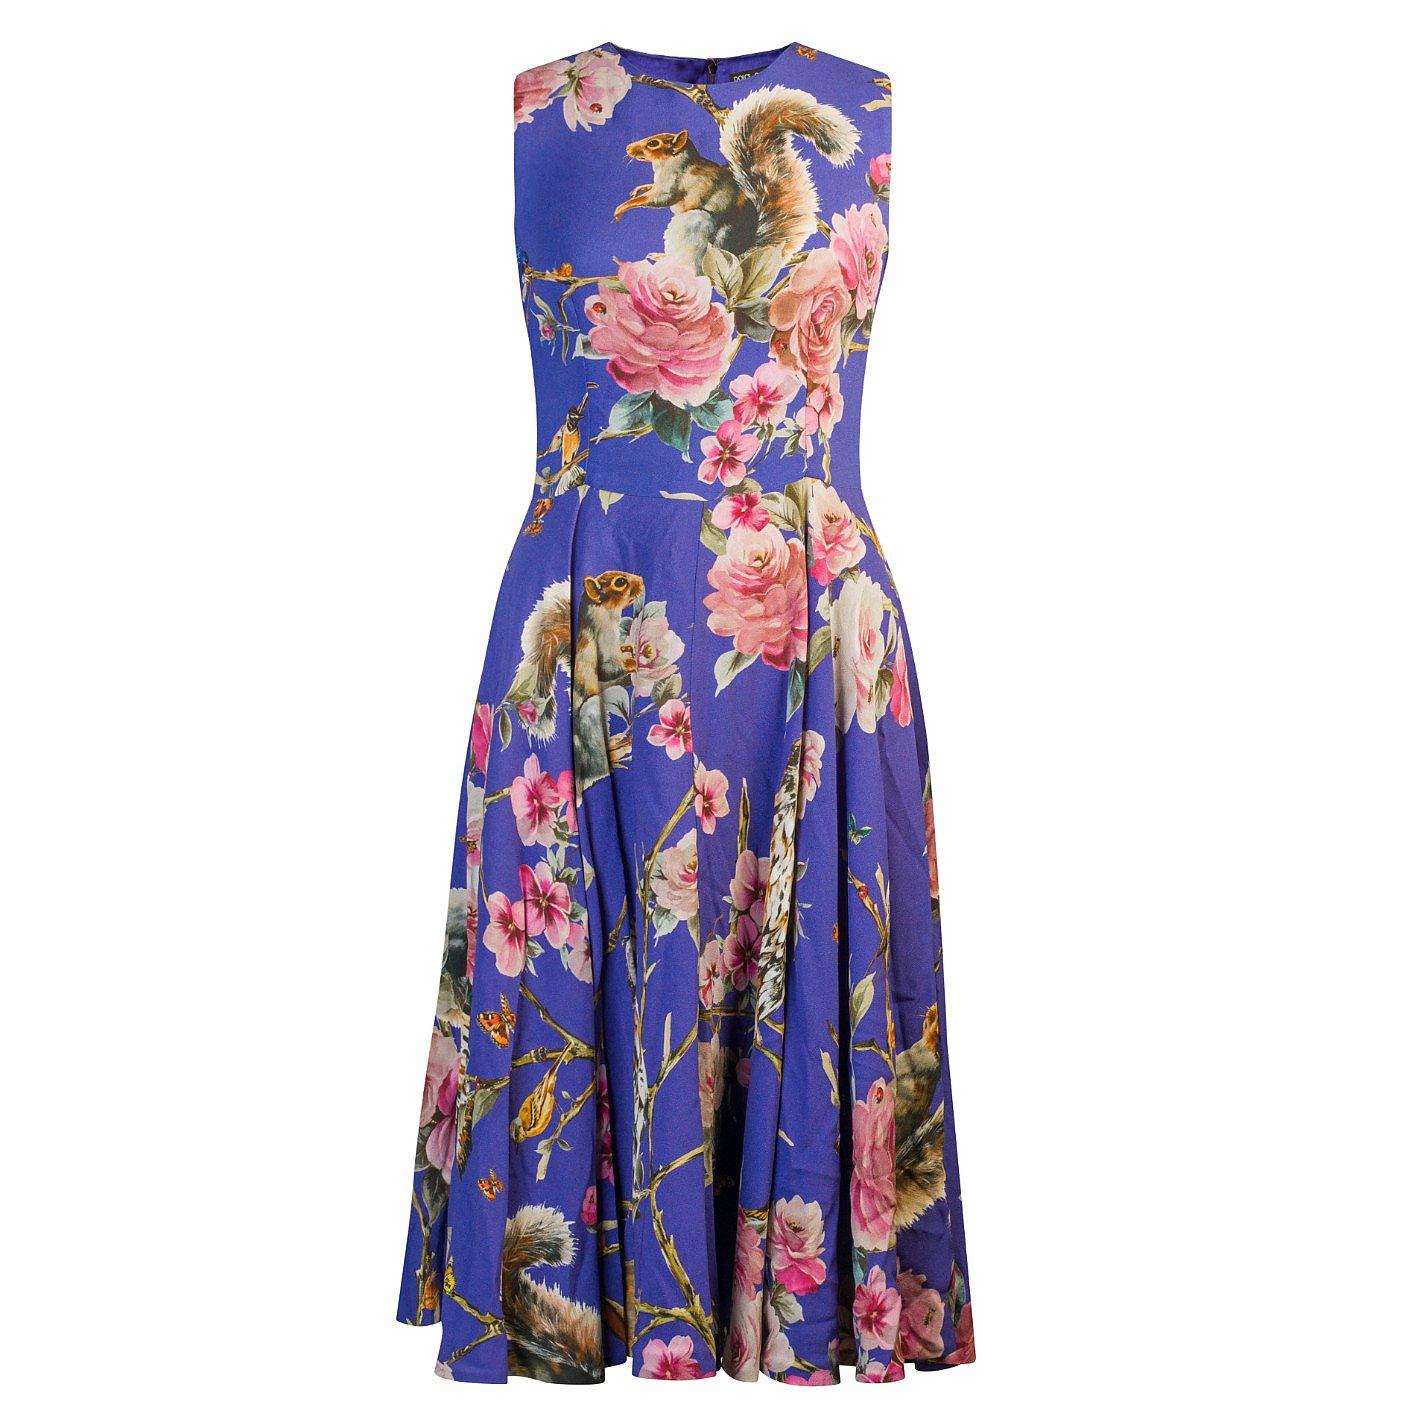 DOLCE & GABBANA Animal & Floral Print Dress